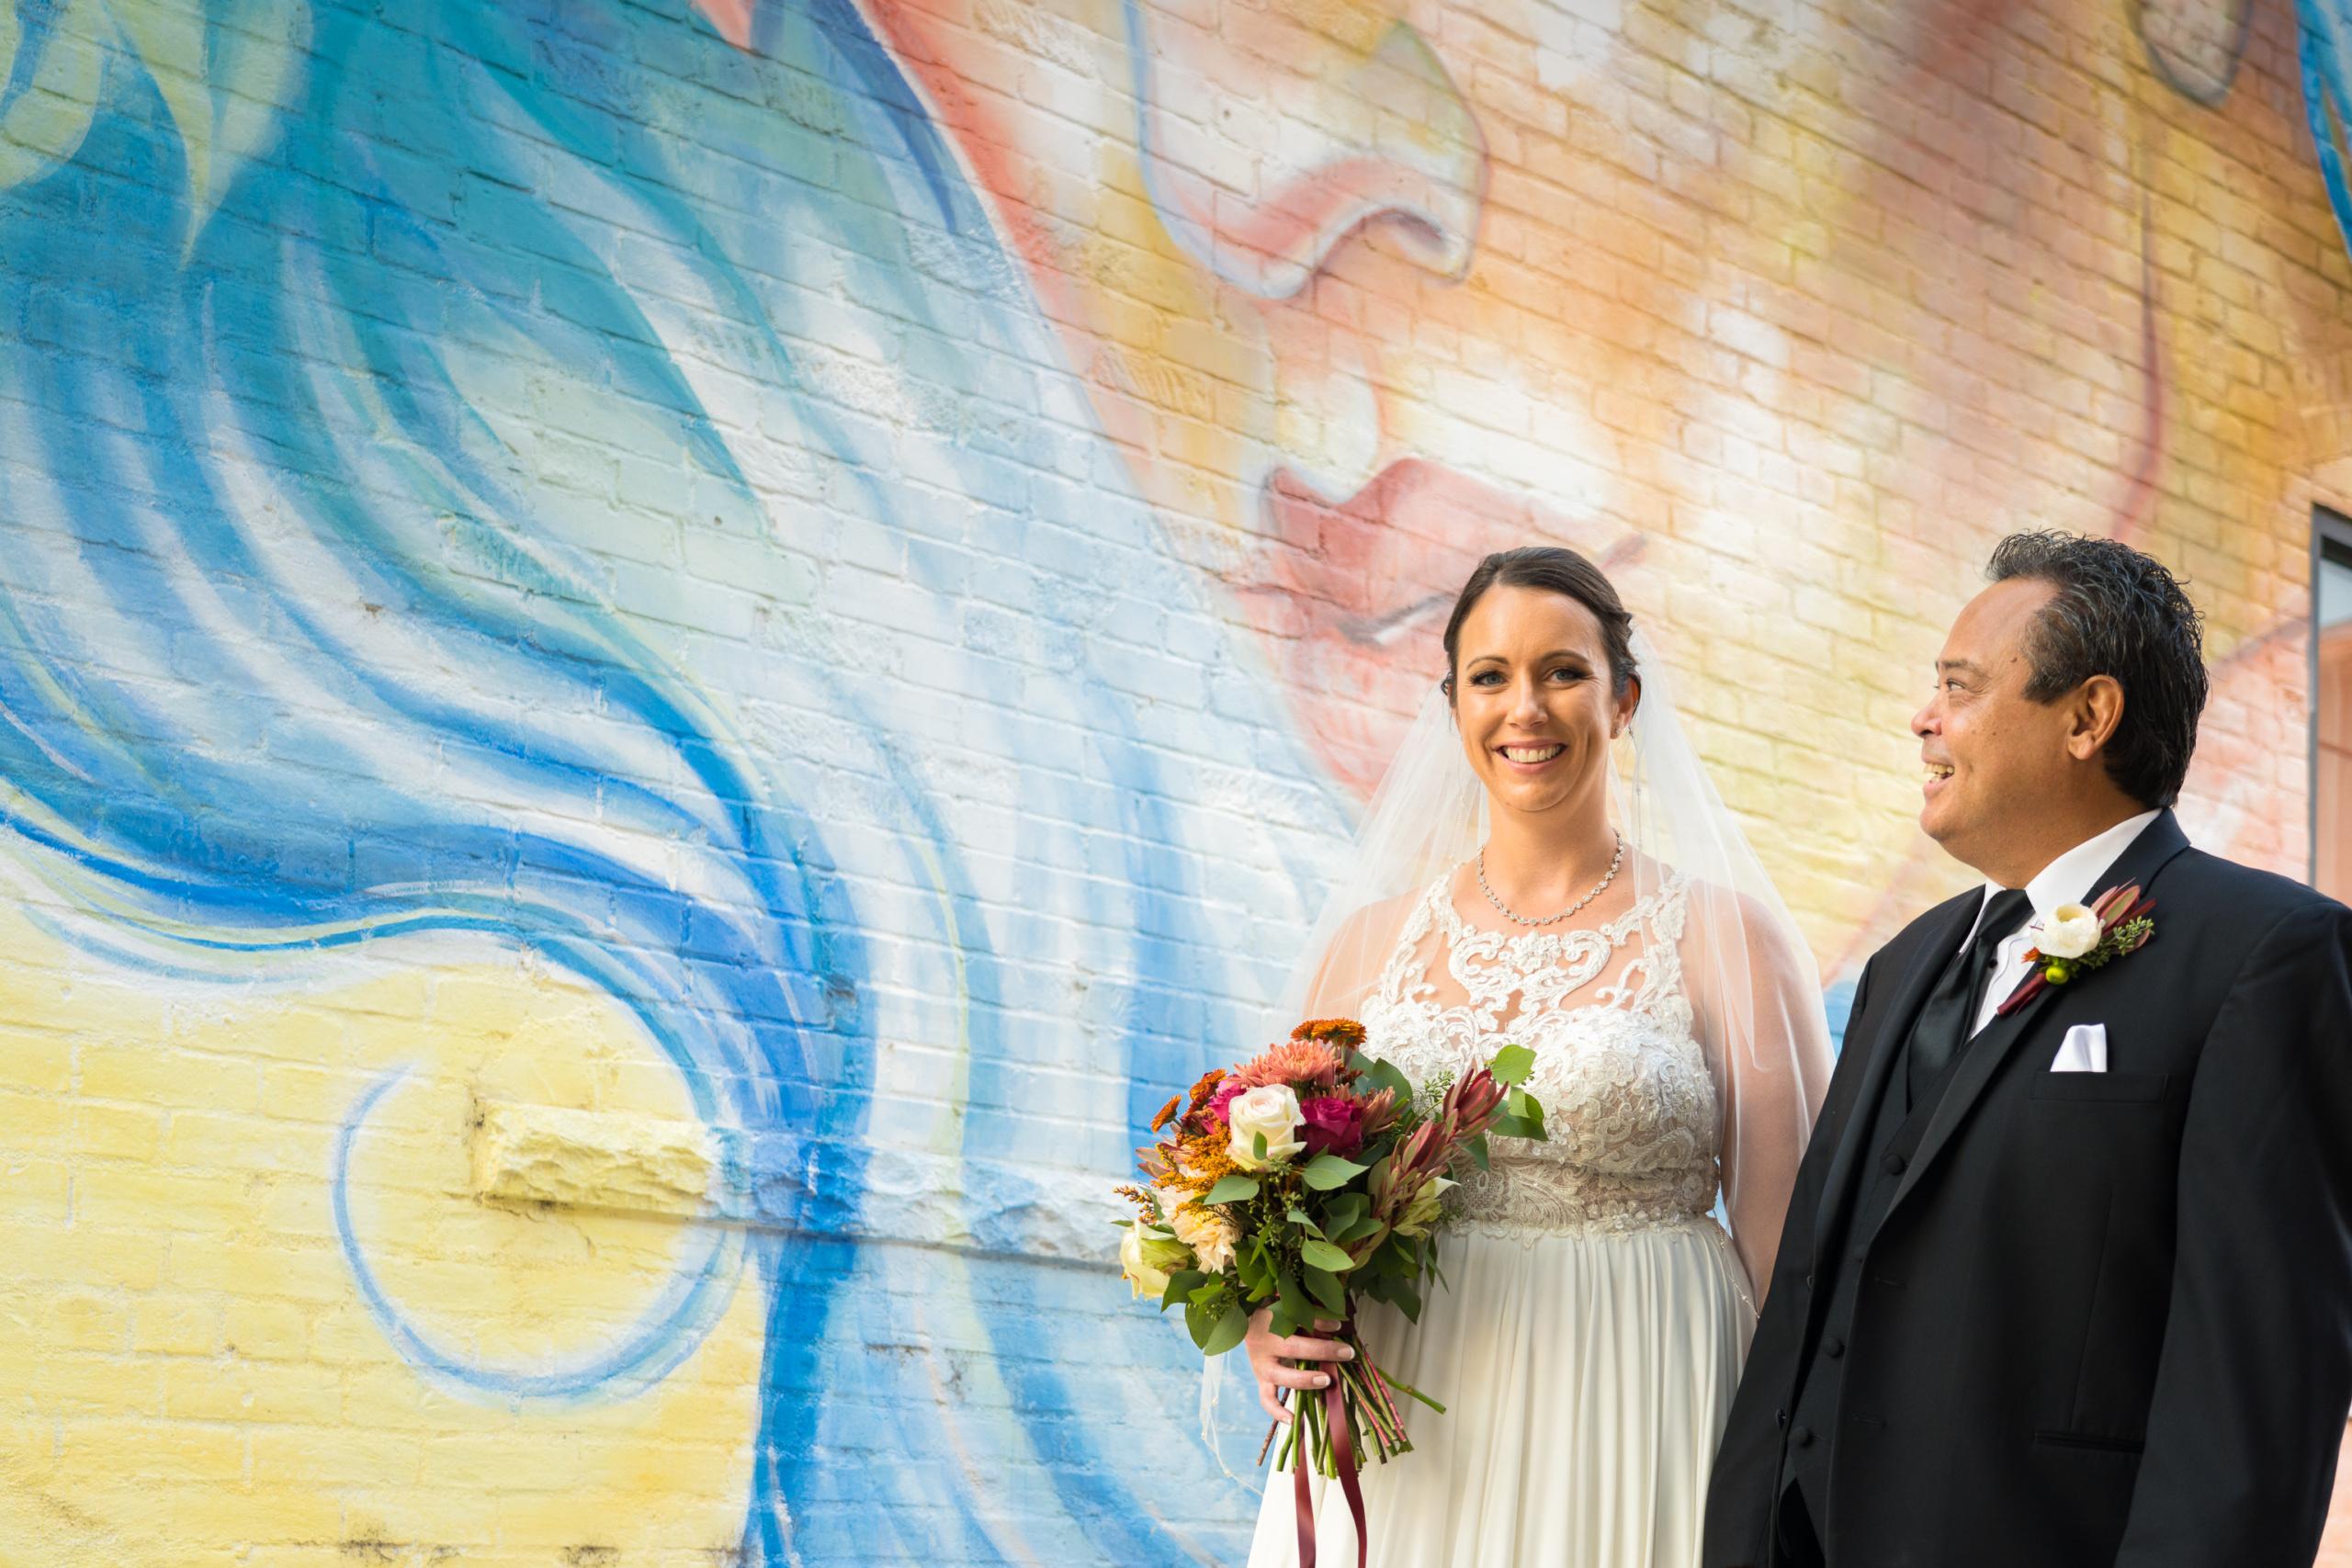 Downtown Loveland CO Wedding Venue